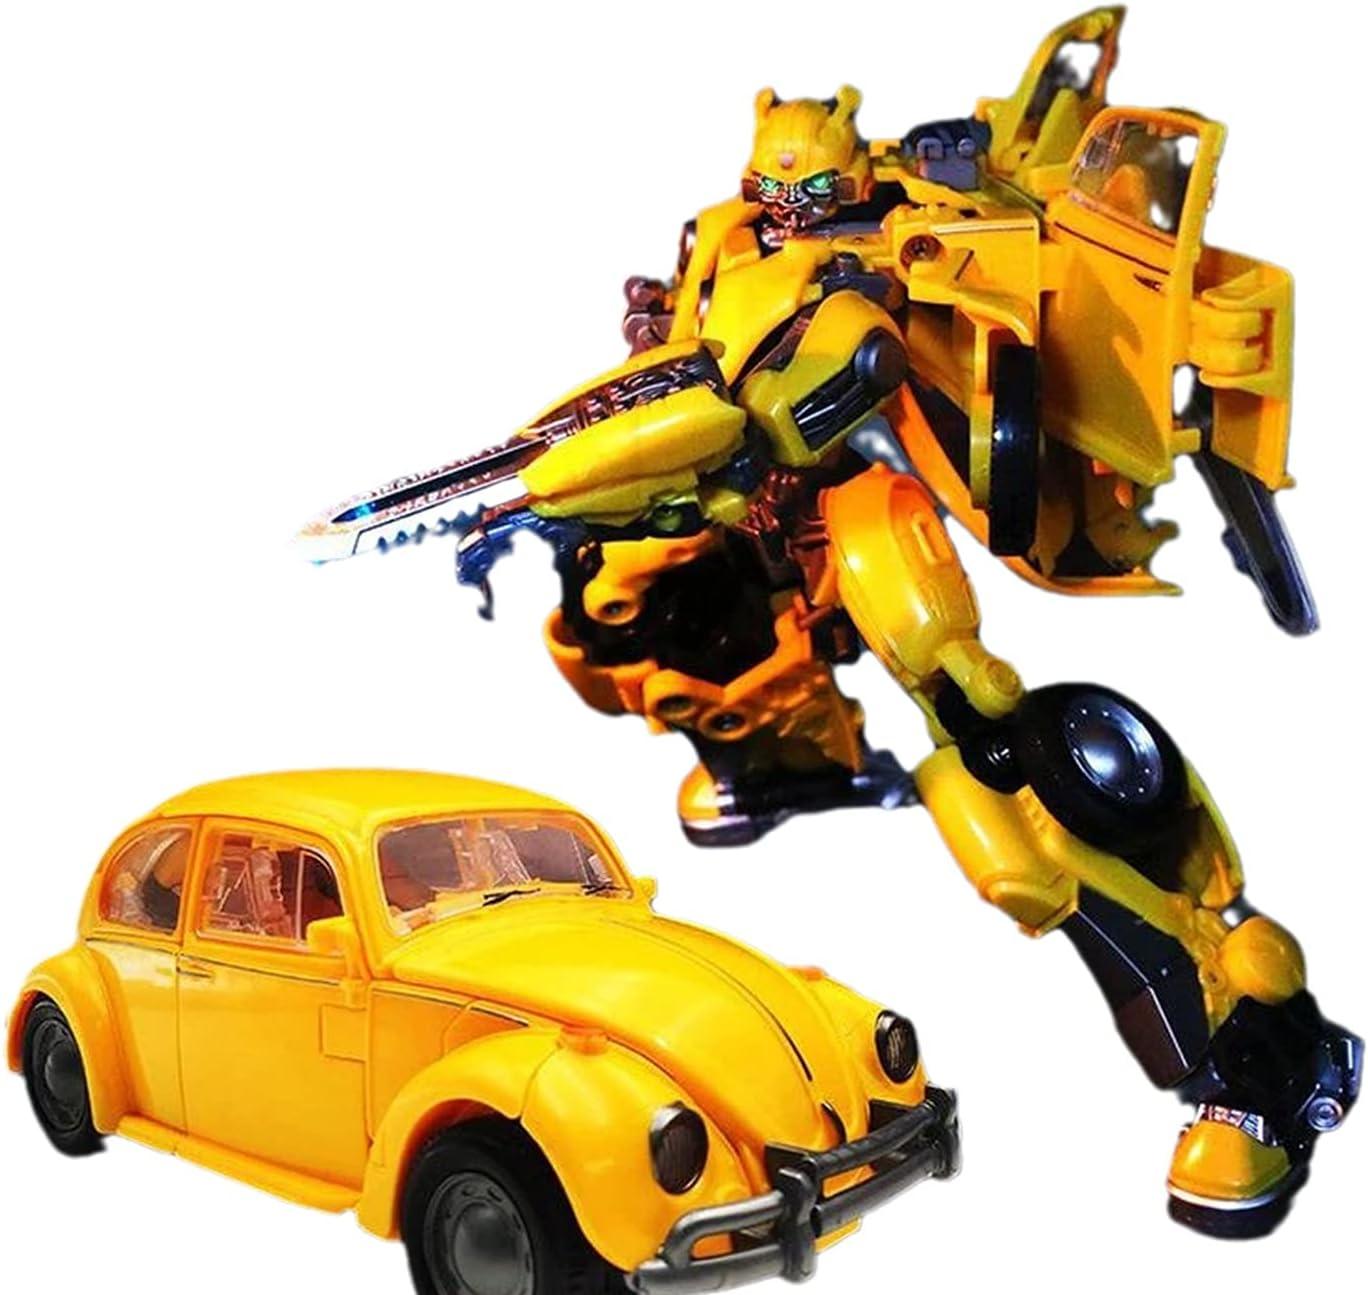 Popular standard MKLL Transformer Toys Studio Milwaukee Mall Series Act Third-Party 18 Bumblebee